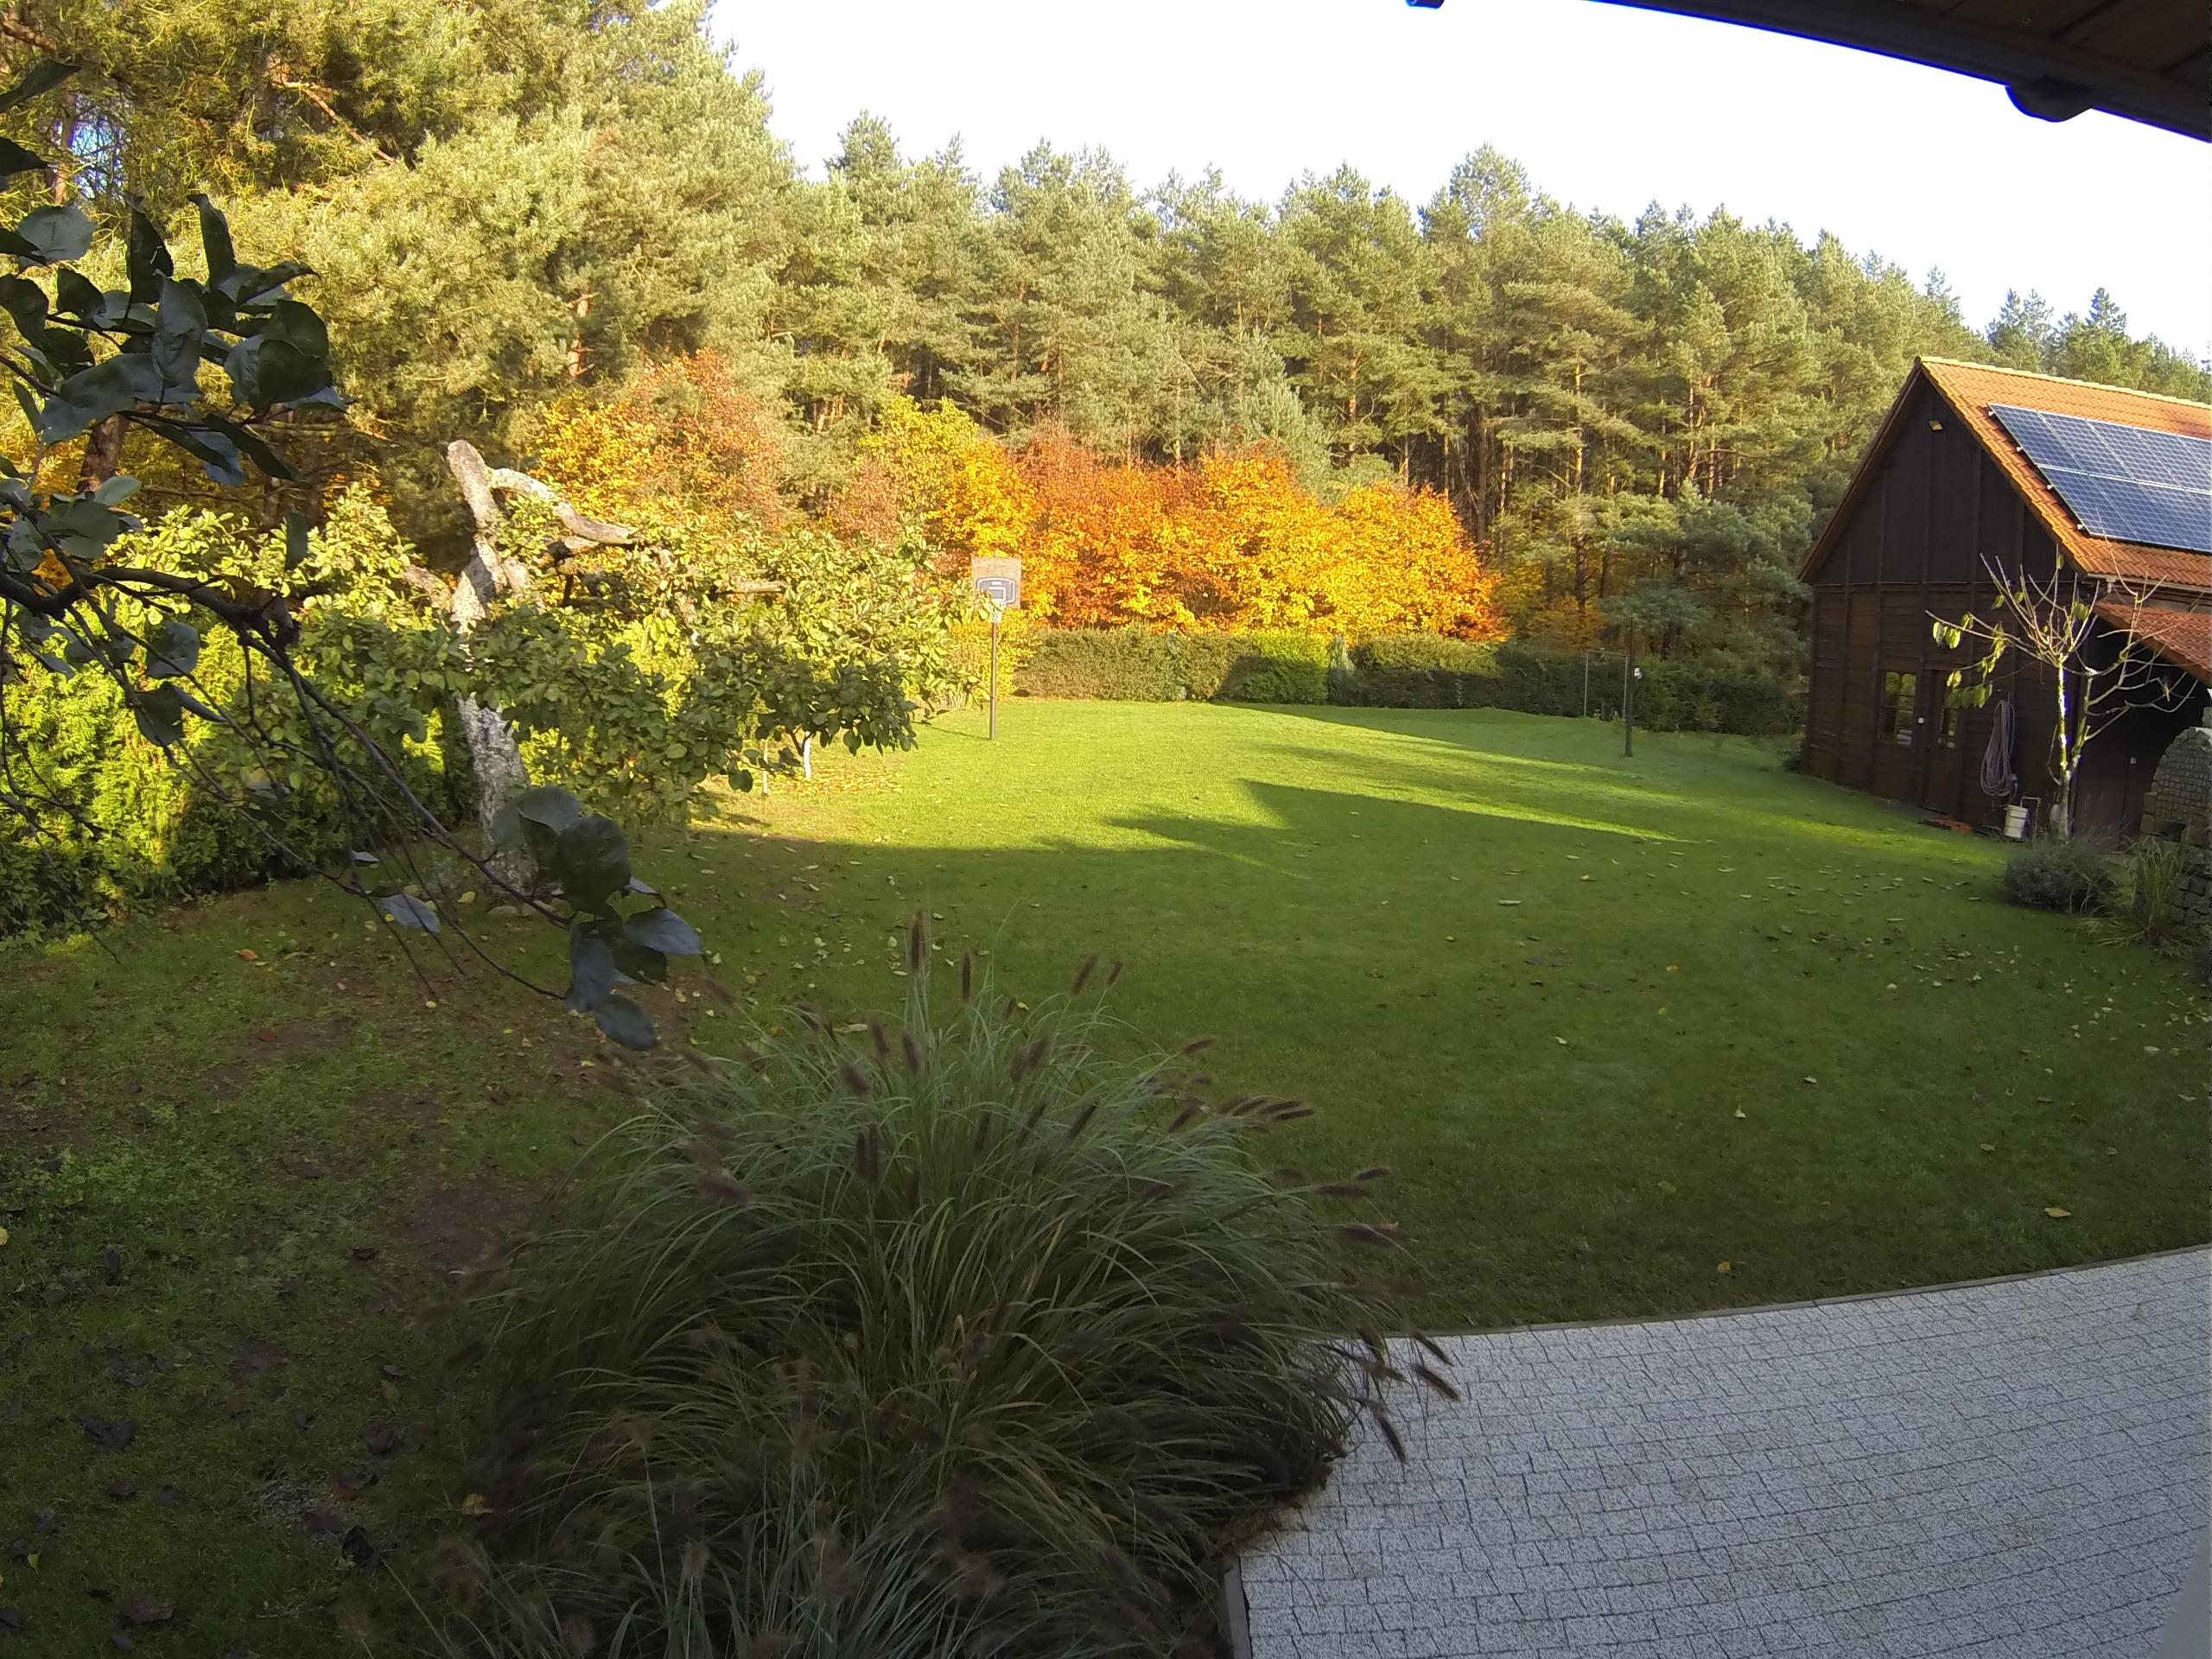 Allein im Wald Ostsee Ferienhaus Dany Raj Houses for